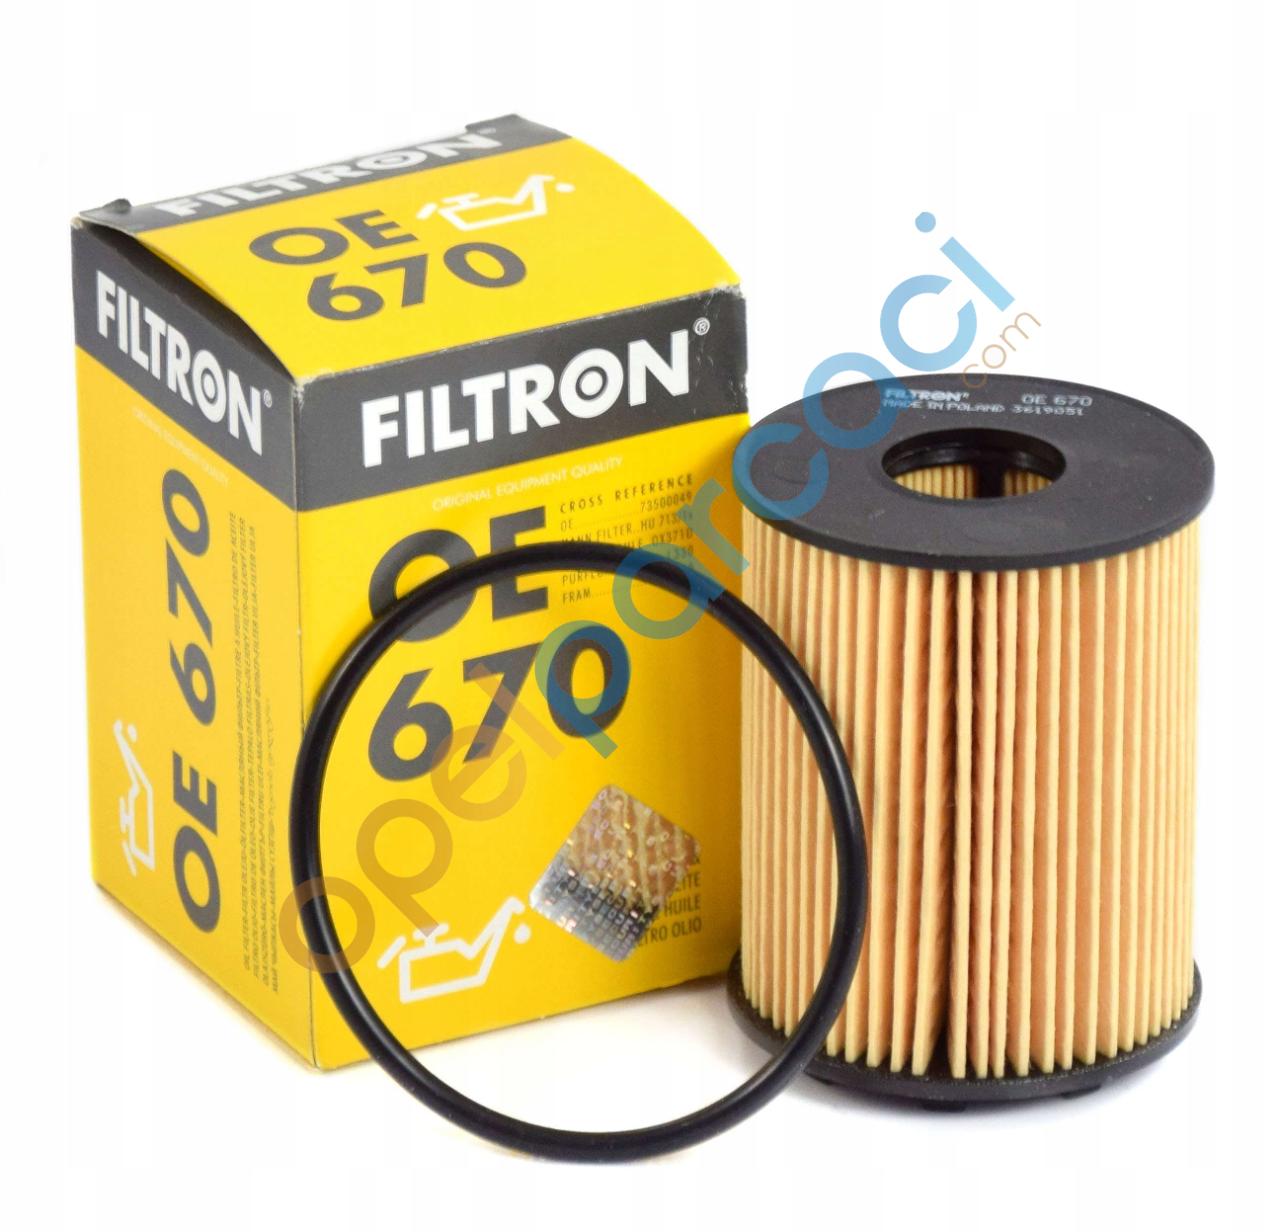 Opel Corsa D 1.3 Dizel Yağ Filtresi FİLTRON (Tırnaklı Tip)